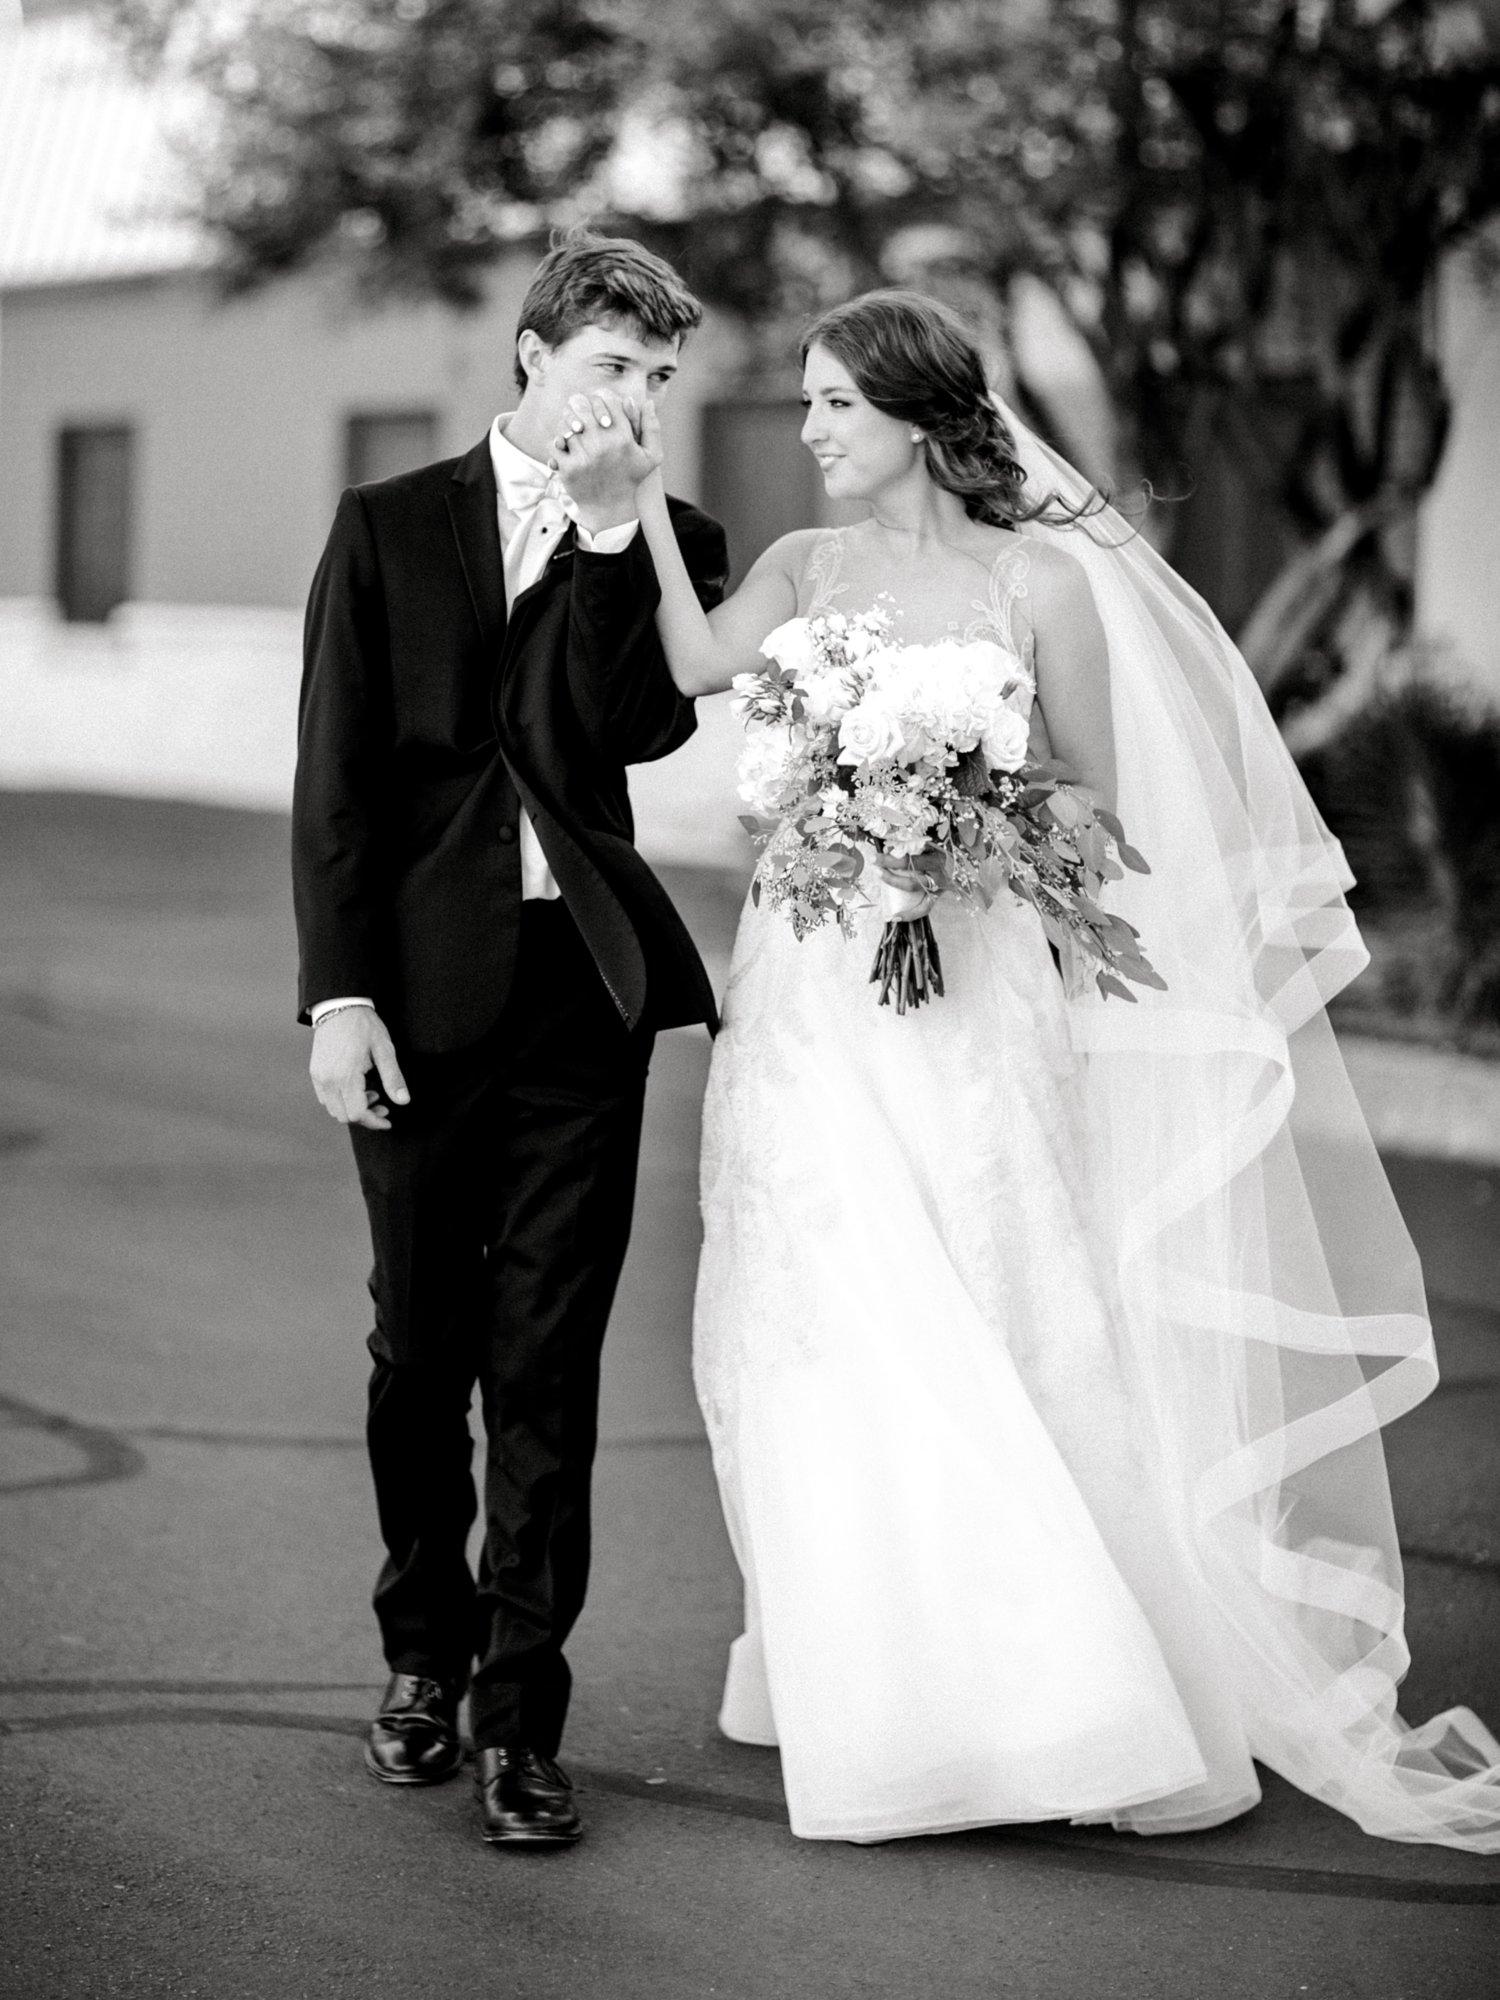 Hunter_and_Molly_Rawls_ALLEEJ_Lubbock_WEDDING_Legacy_Event_Center_0154.jpg